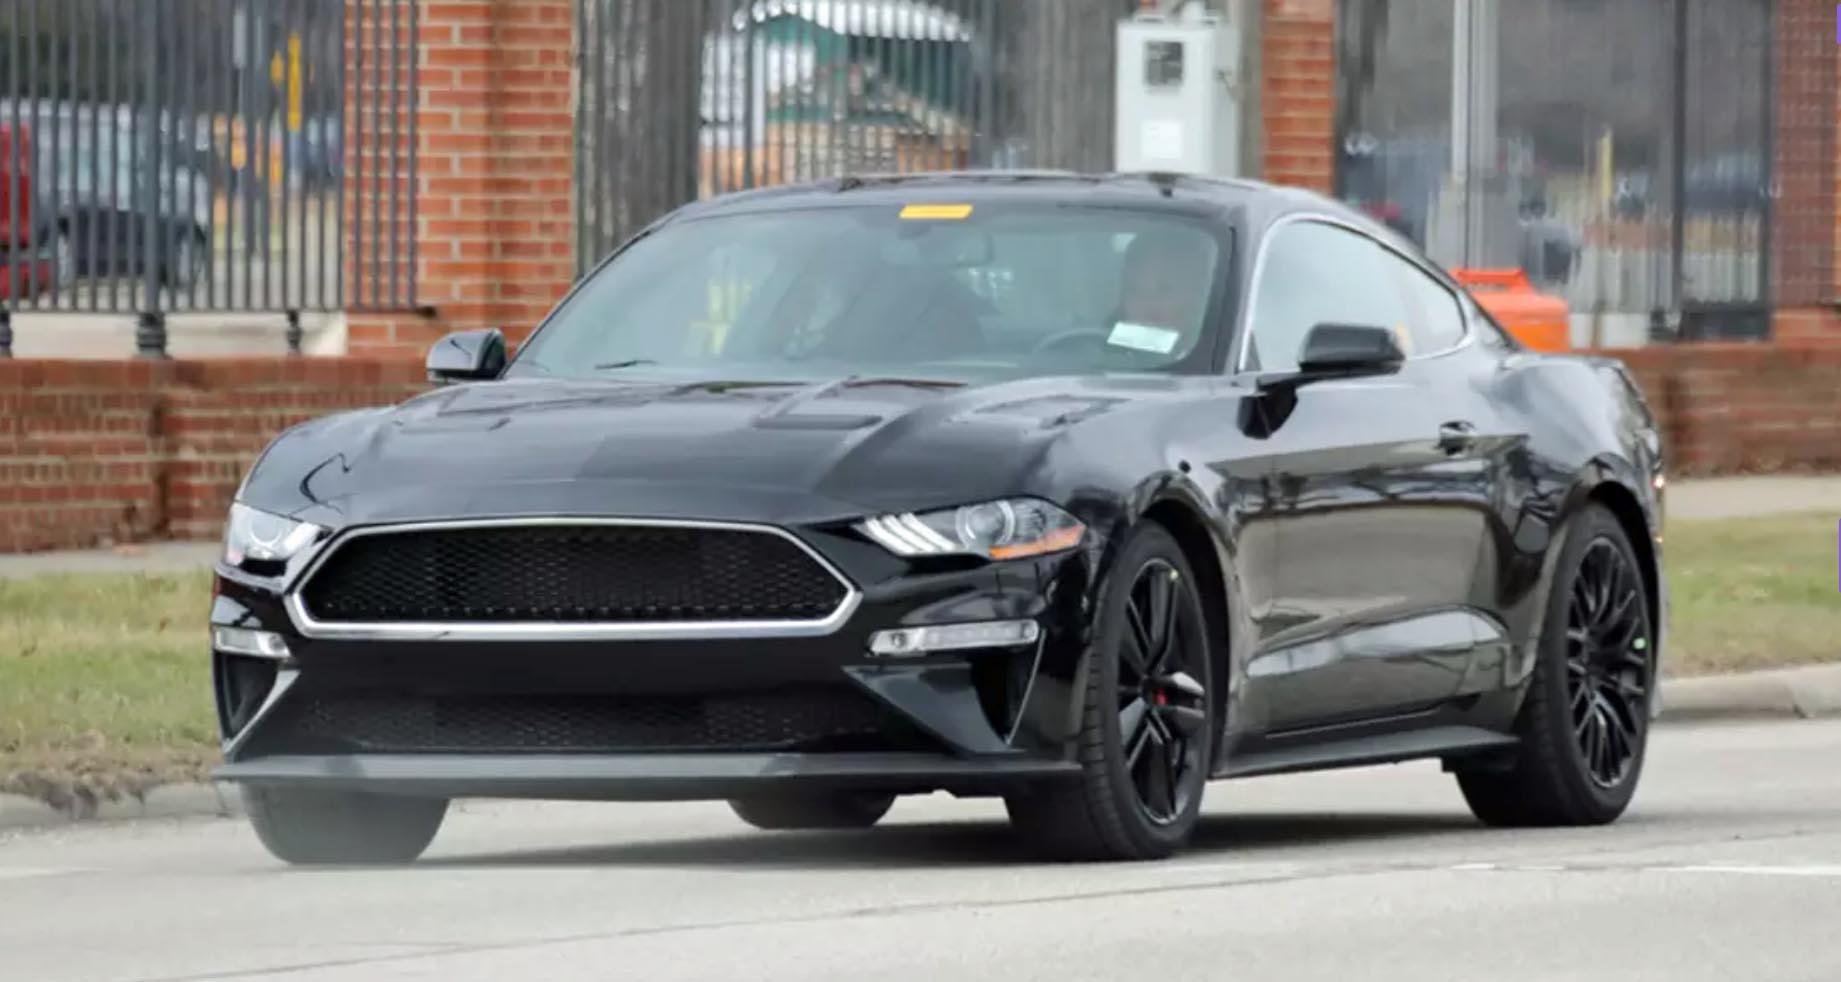 2019-ford-mustang-bullitt-shadow-black.jpg